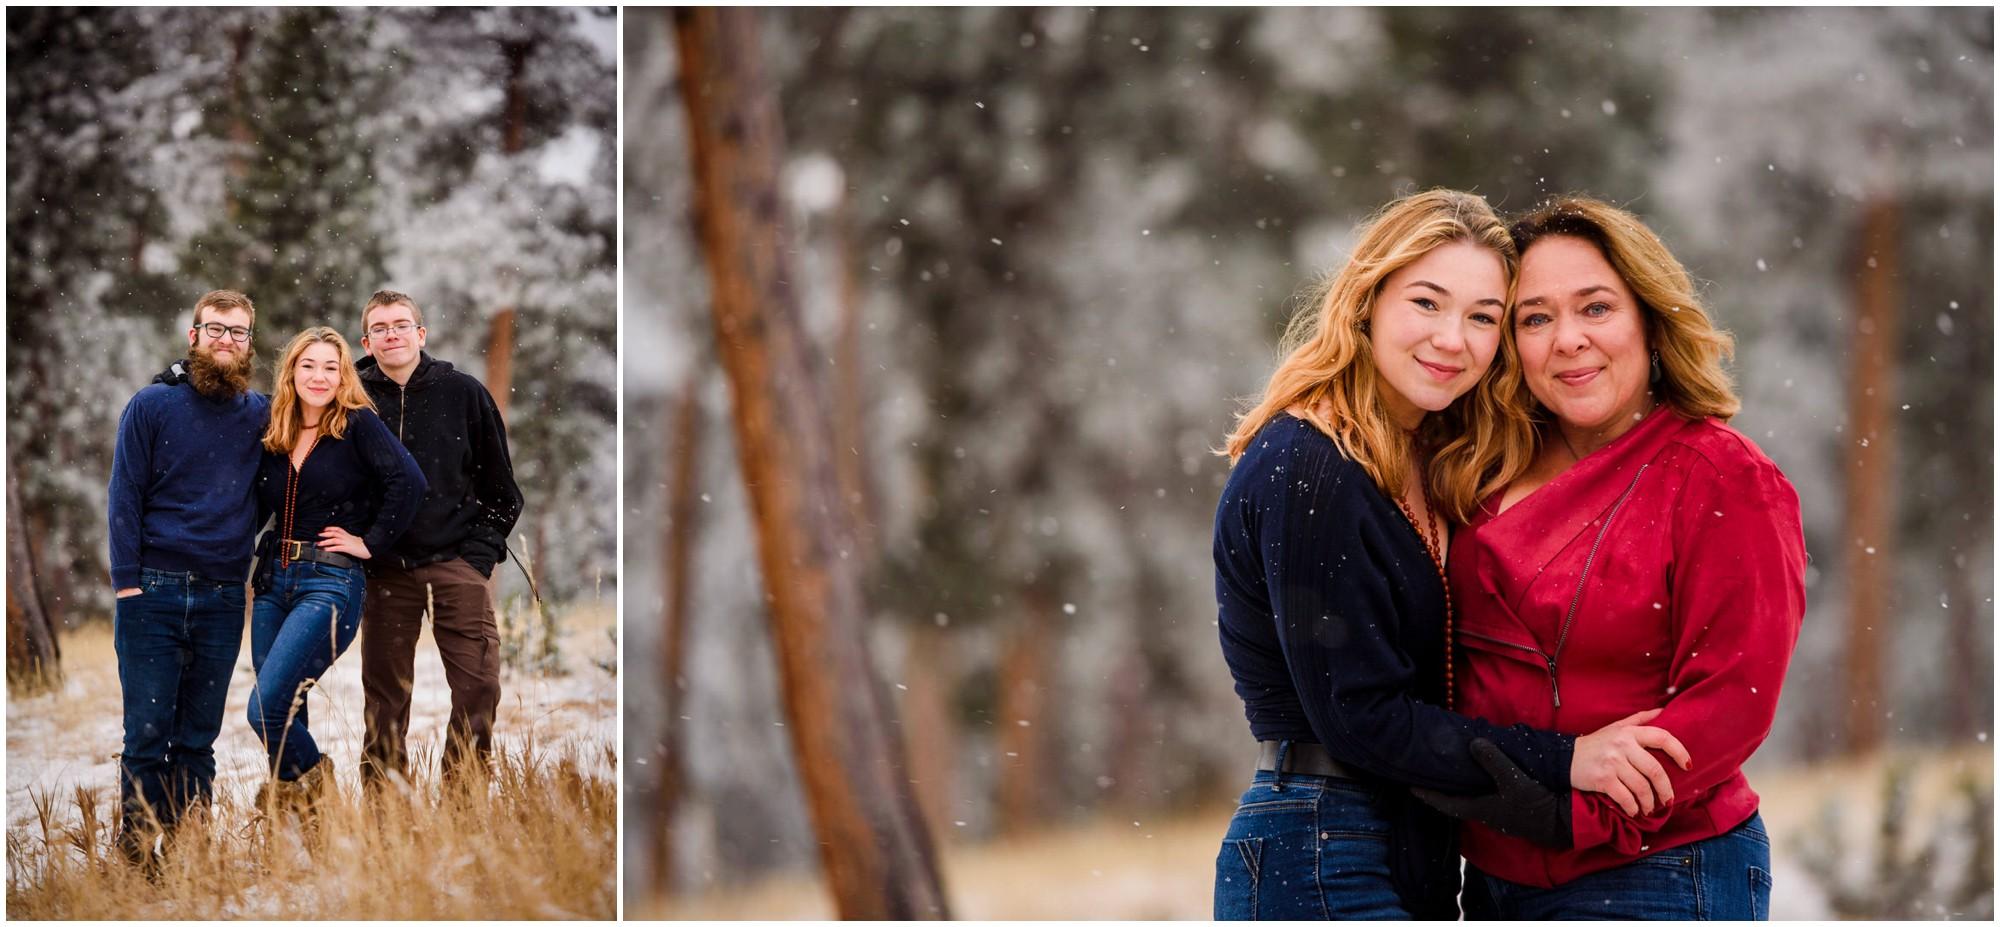 22-Evergreen-colorado-Winter-Family-photography.jpg